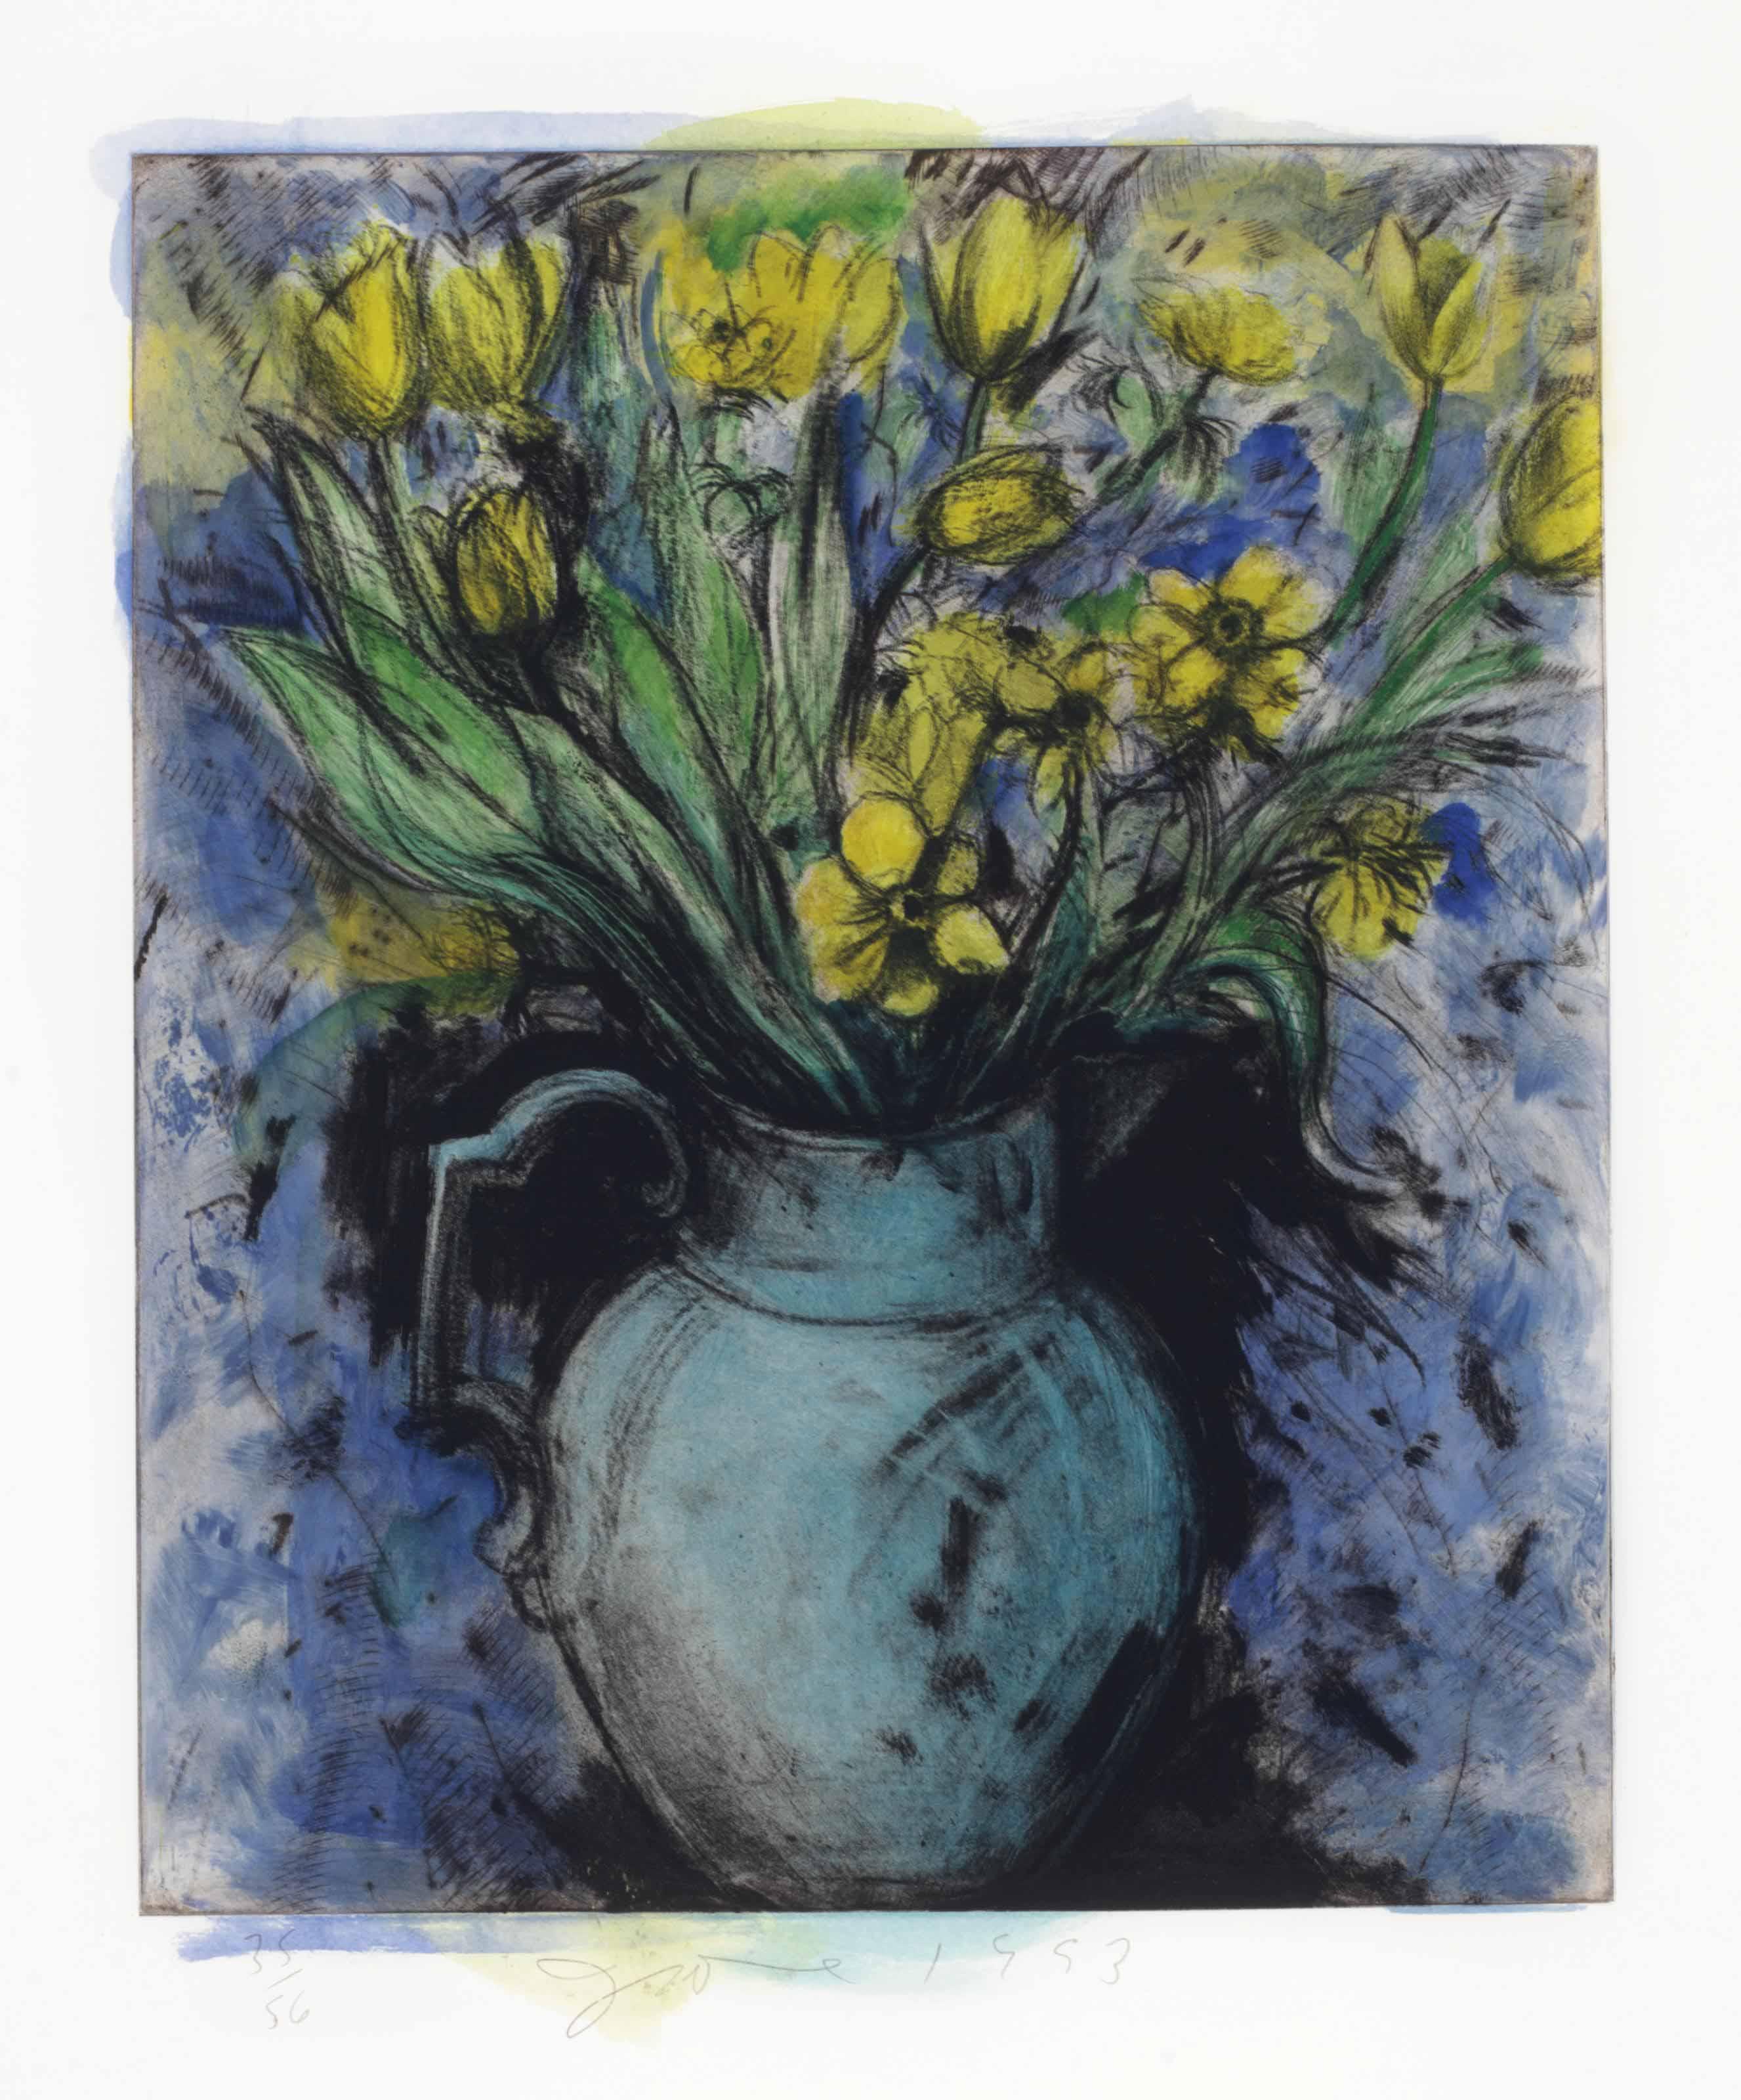 Jim Dine B 1935 Blue Vase Yellow Flowers 20th Century